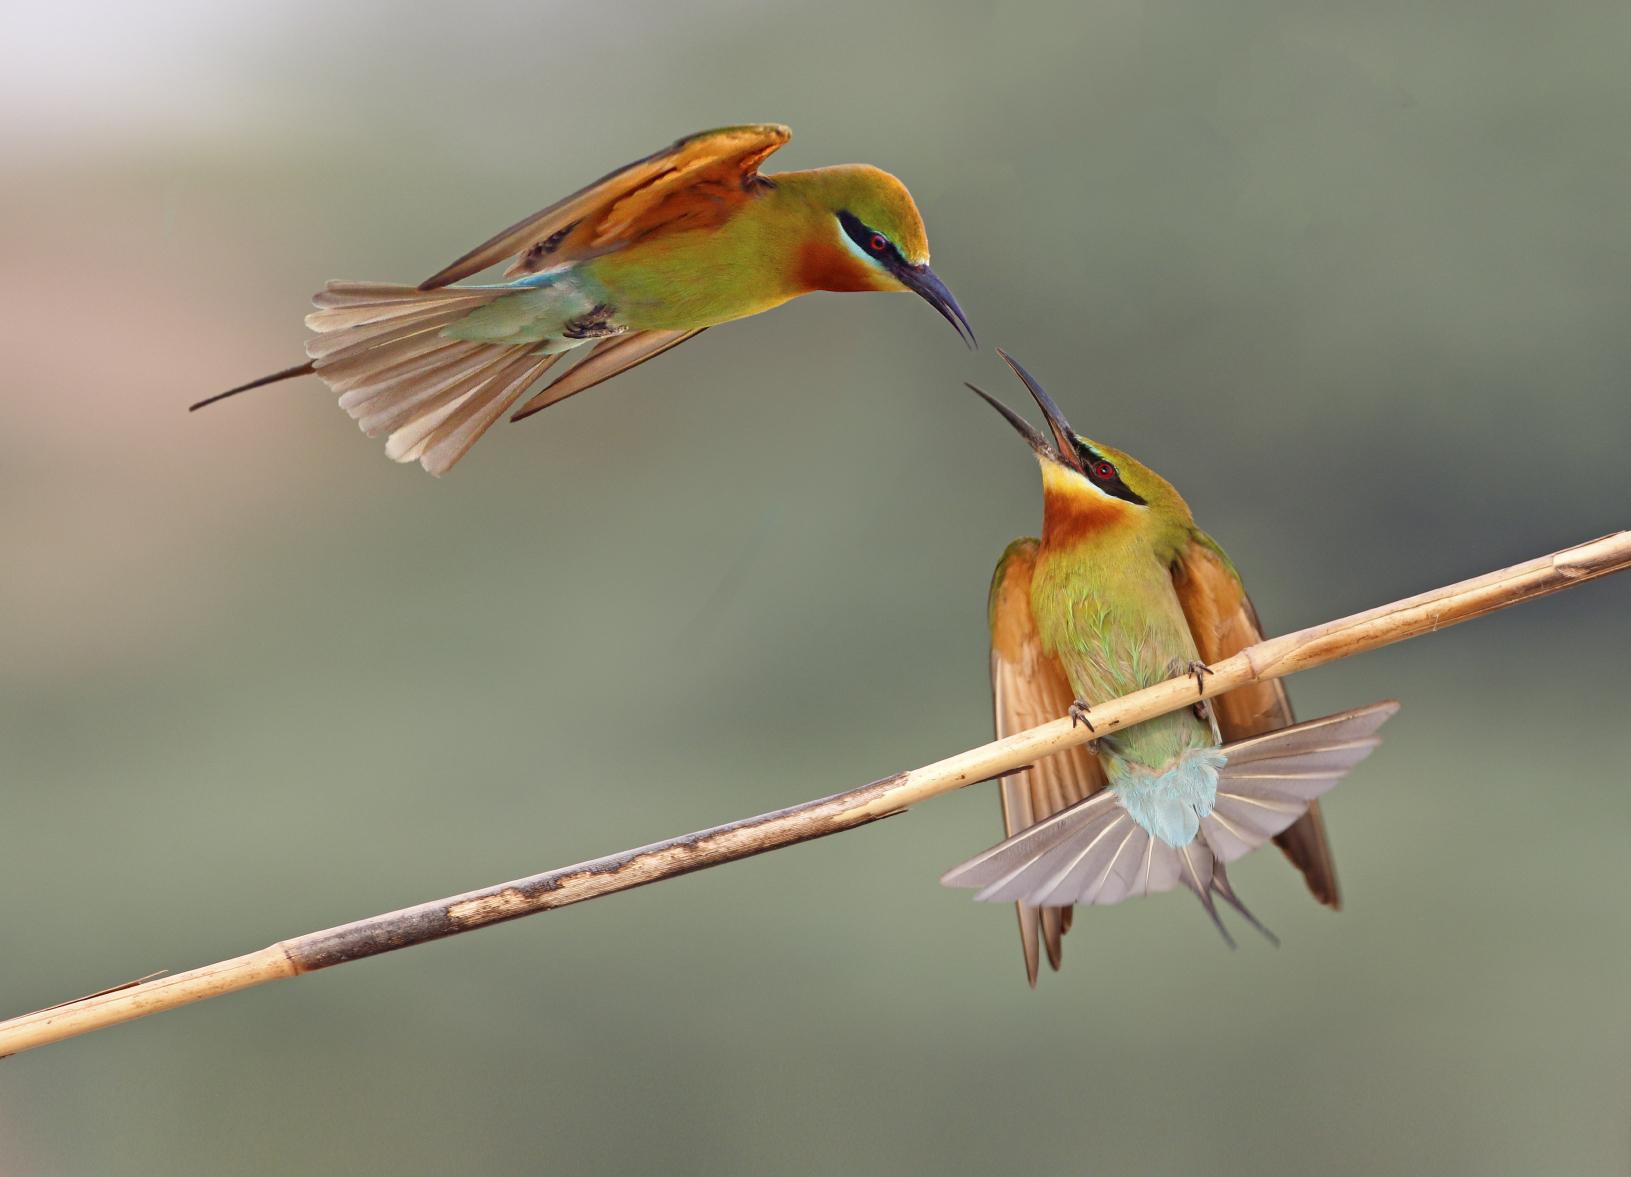 Mid Air Disagreement